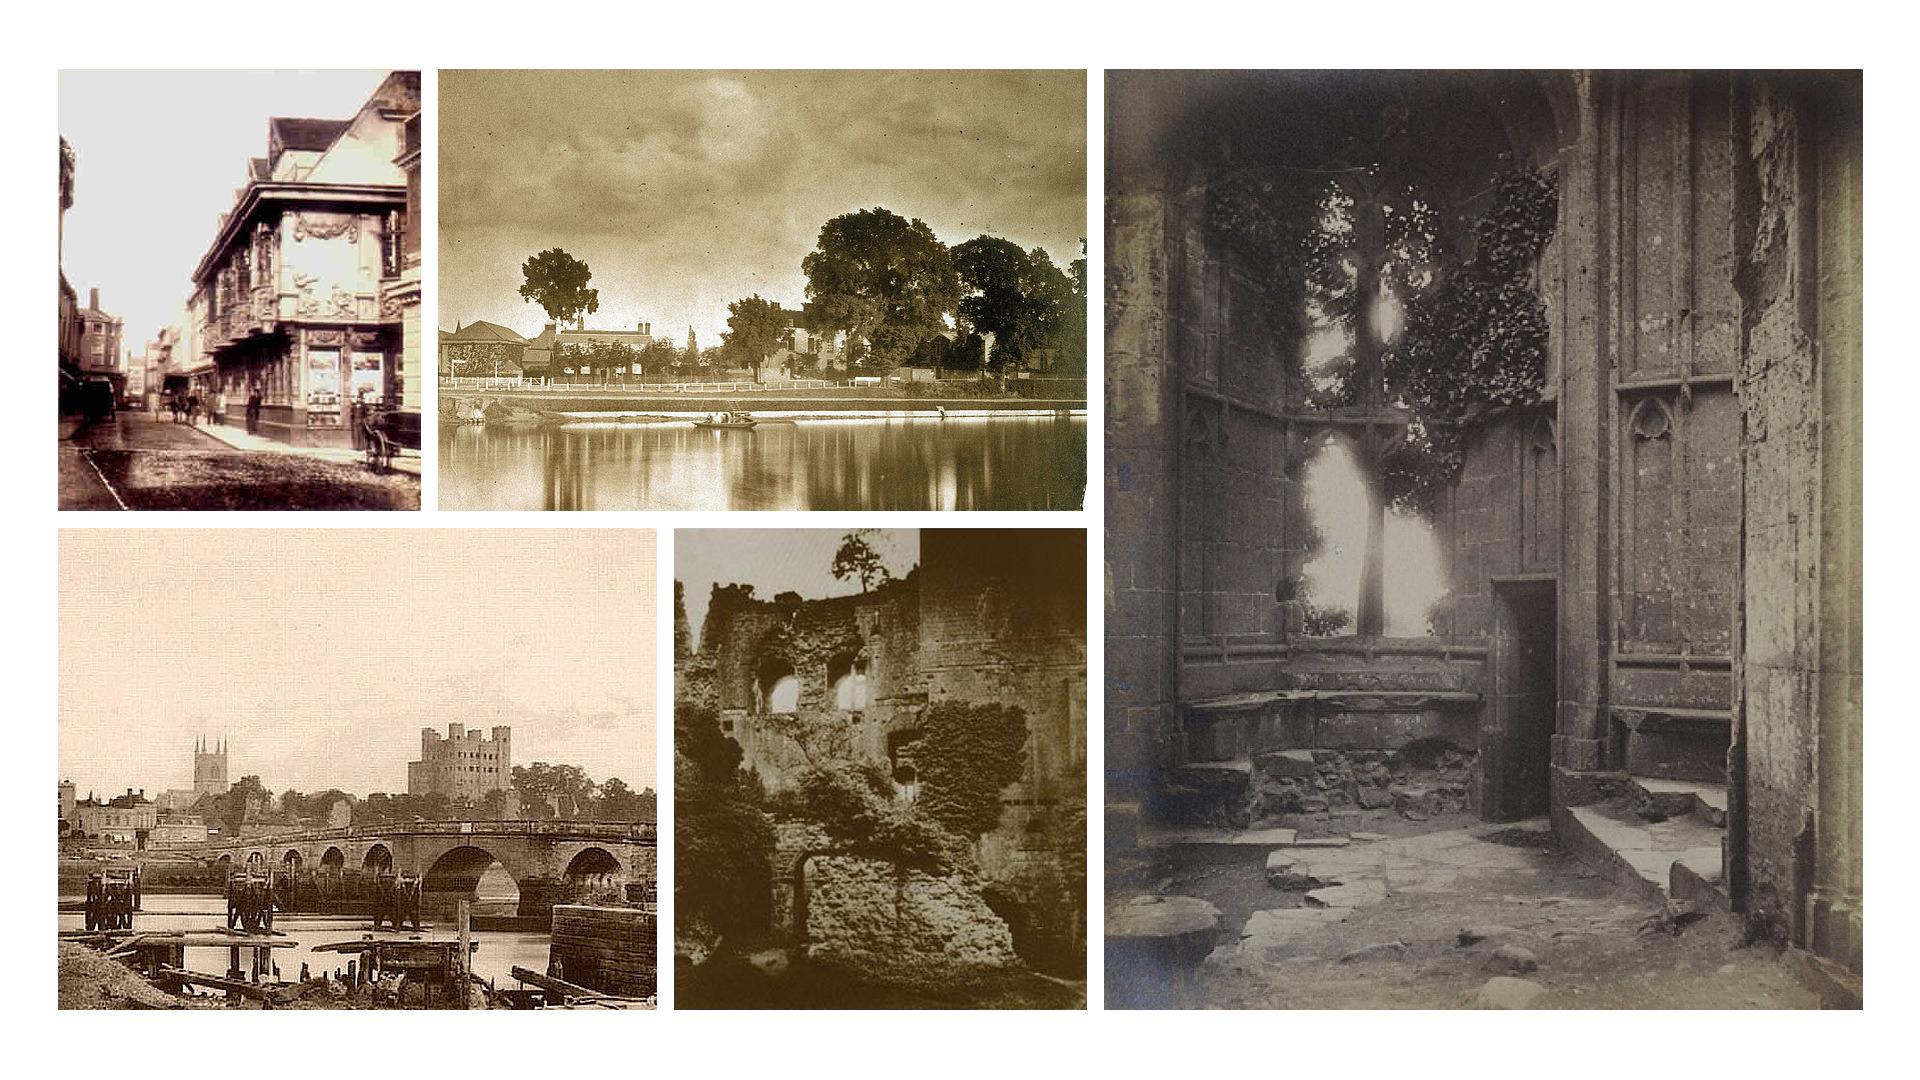 Frederick Scott Archer - Historia de la Fotografía - José Álvarez Fotografía